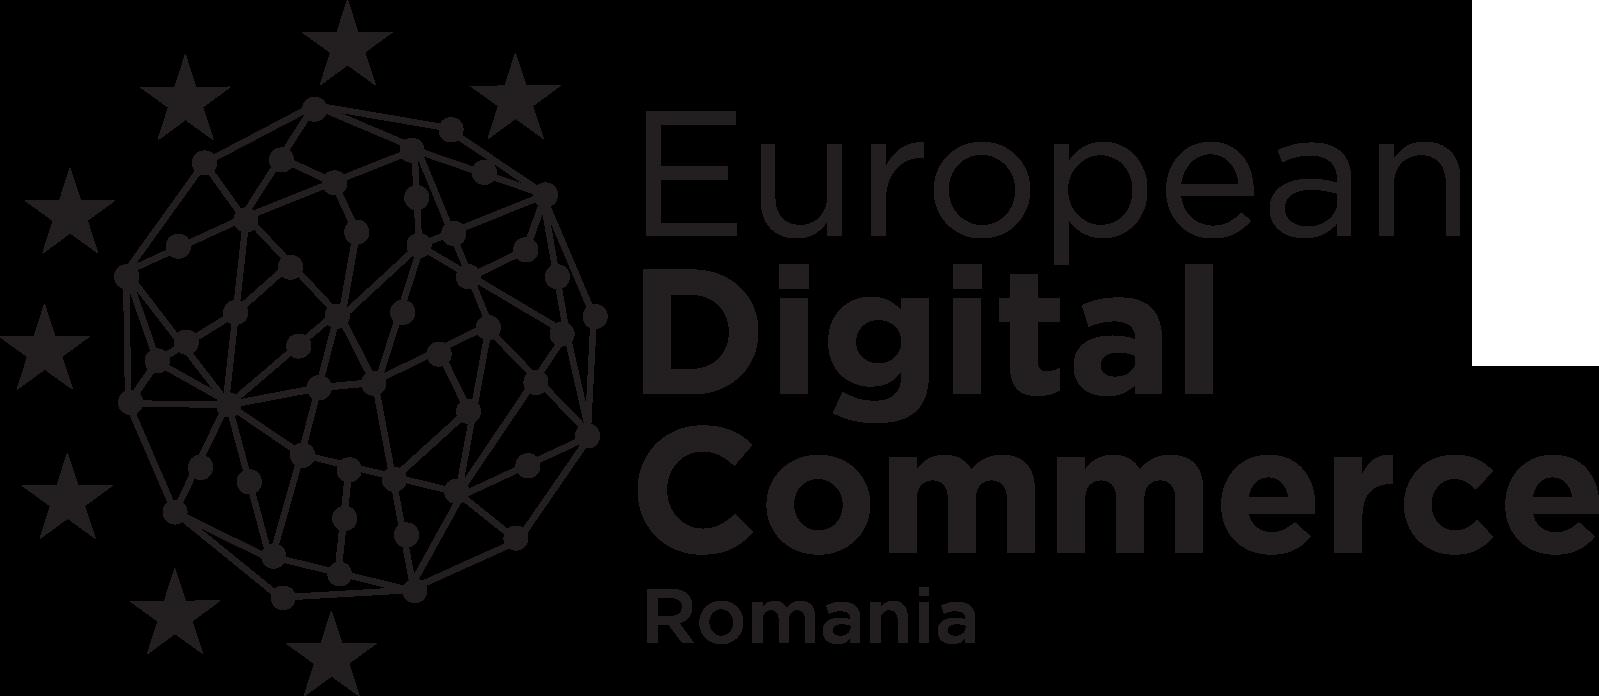 European Digital Commerce 2020}